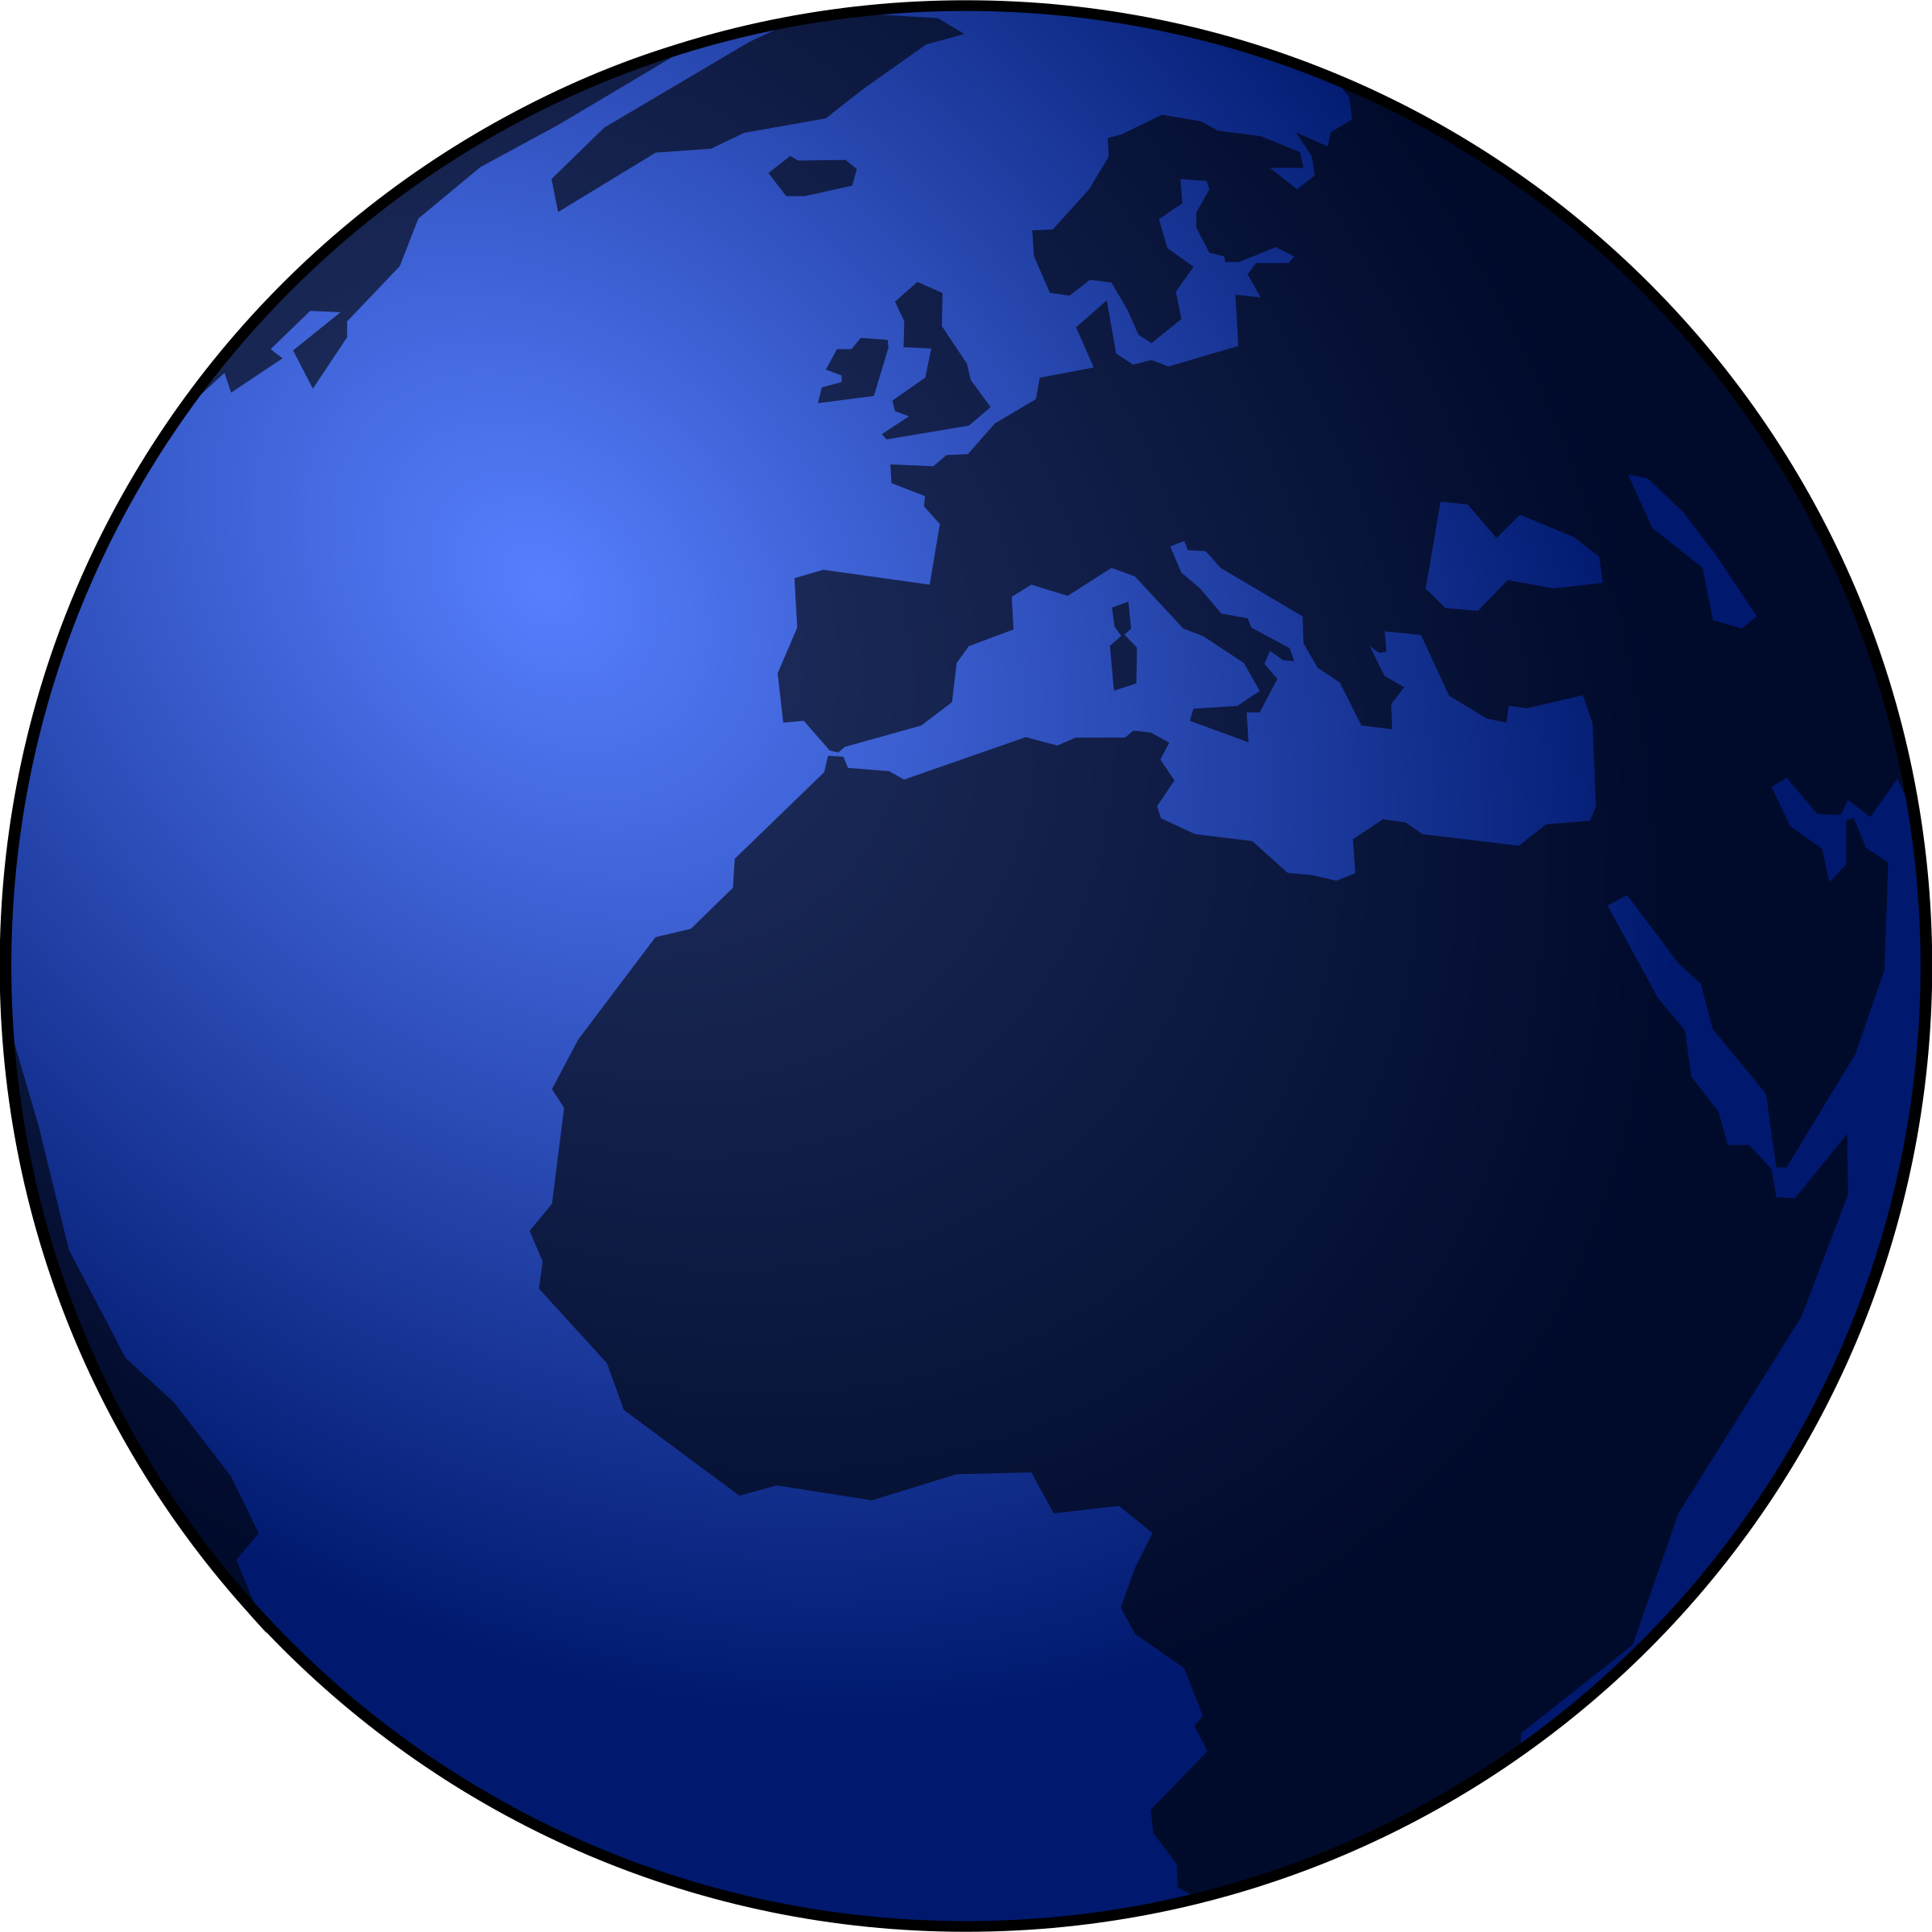 Clipart globe globe world.